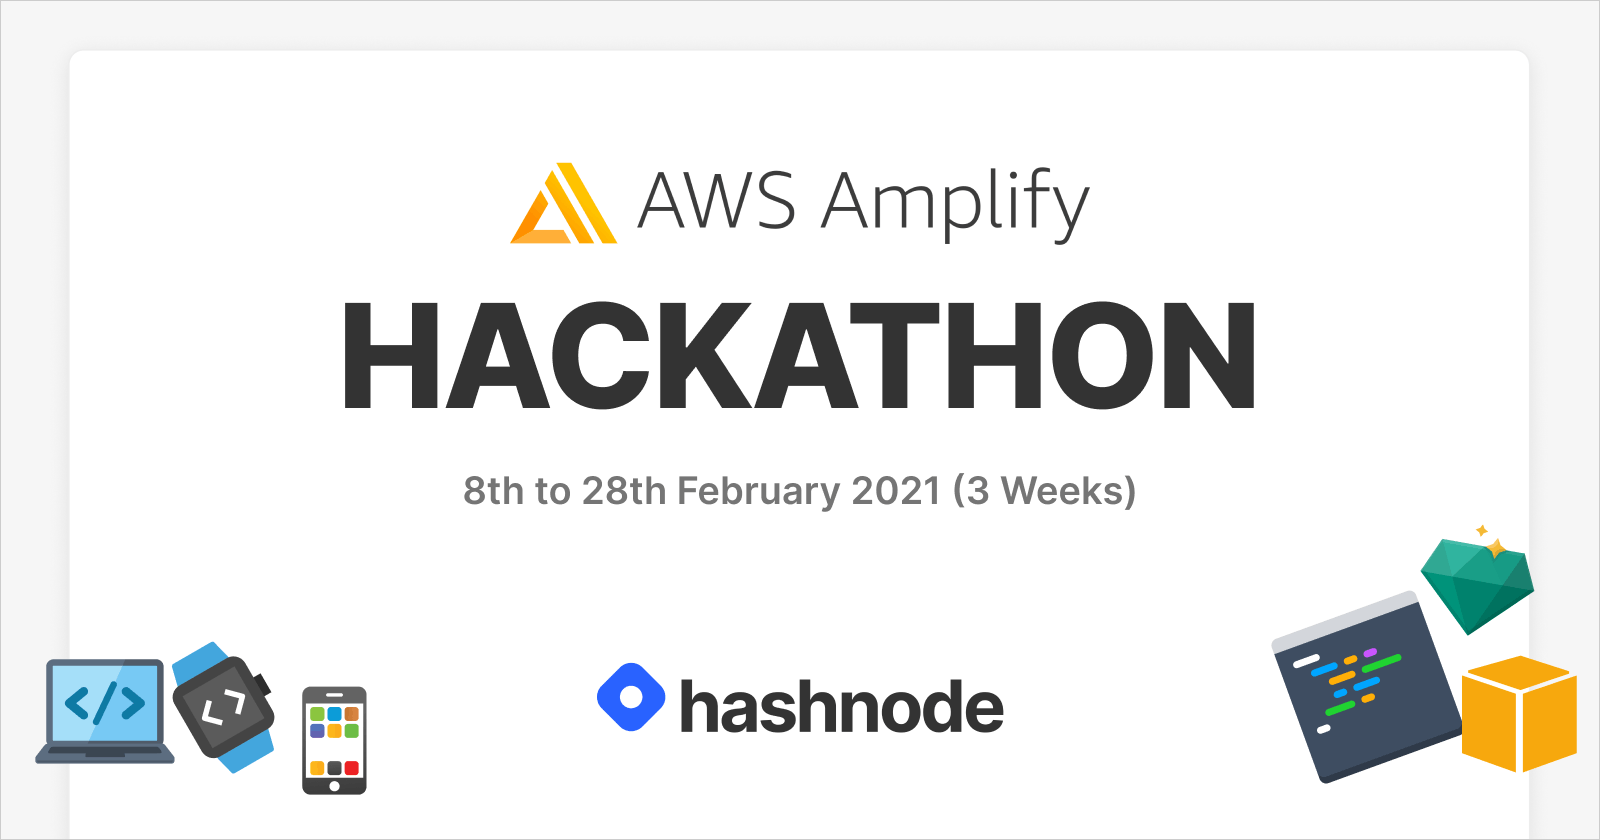 Announcing AWS Amplify Hackathon on Hashnode